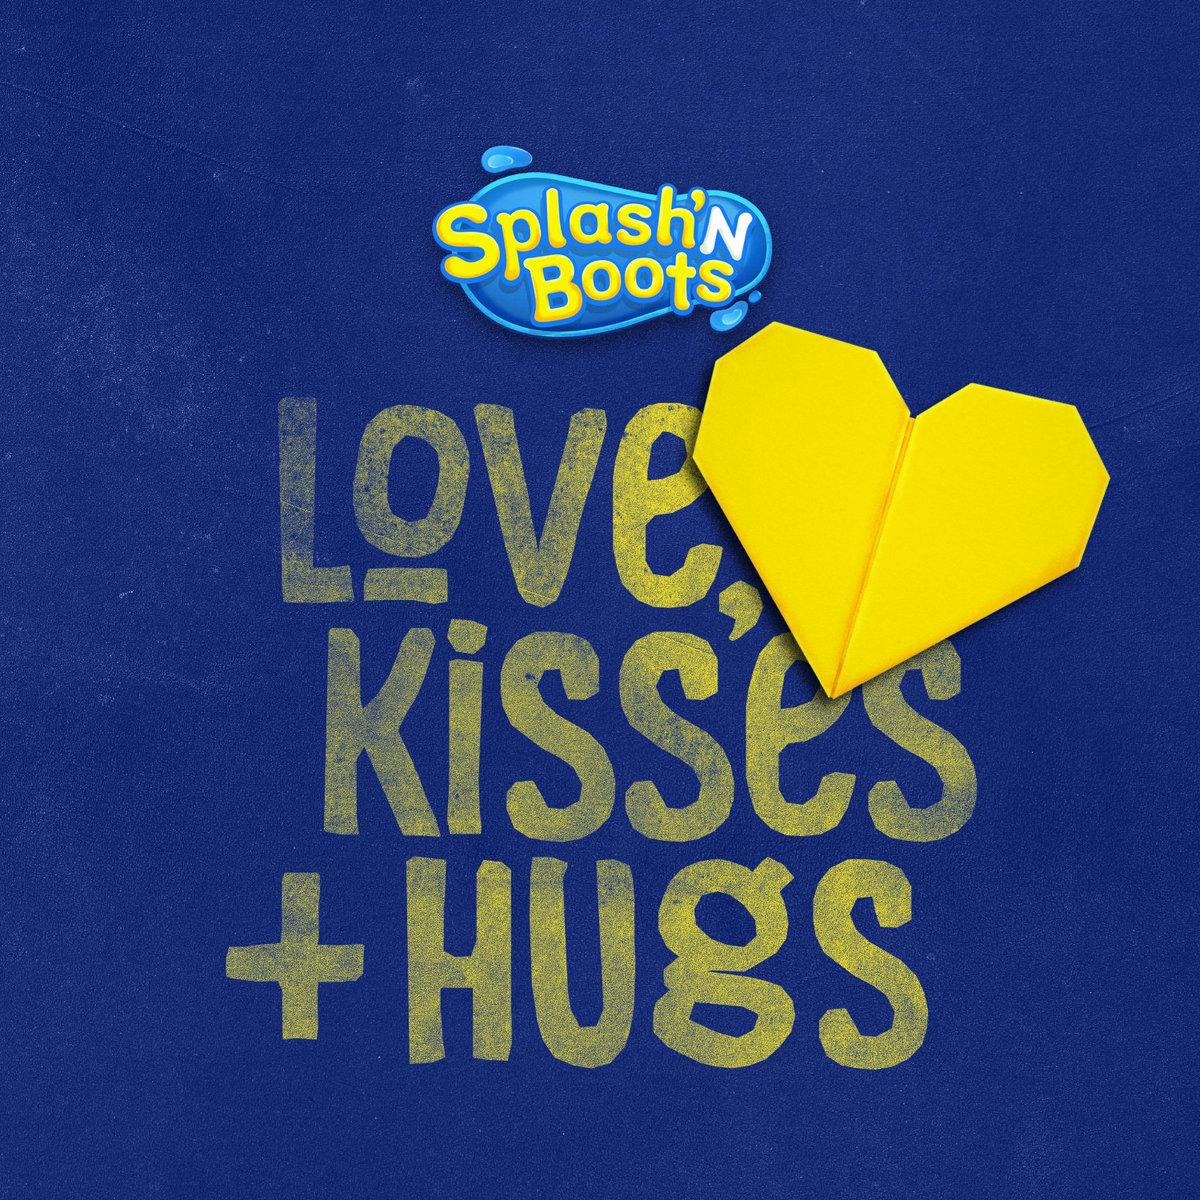 Love Pictures Hugs Kisses - impremedia.net